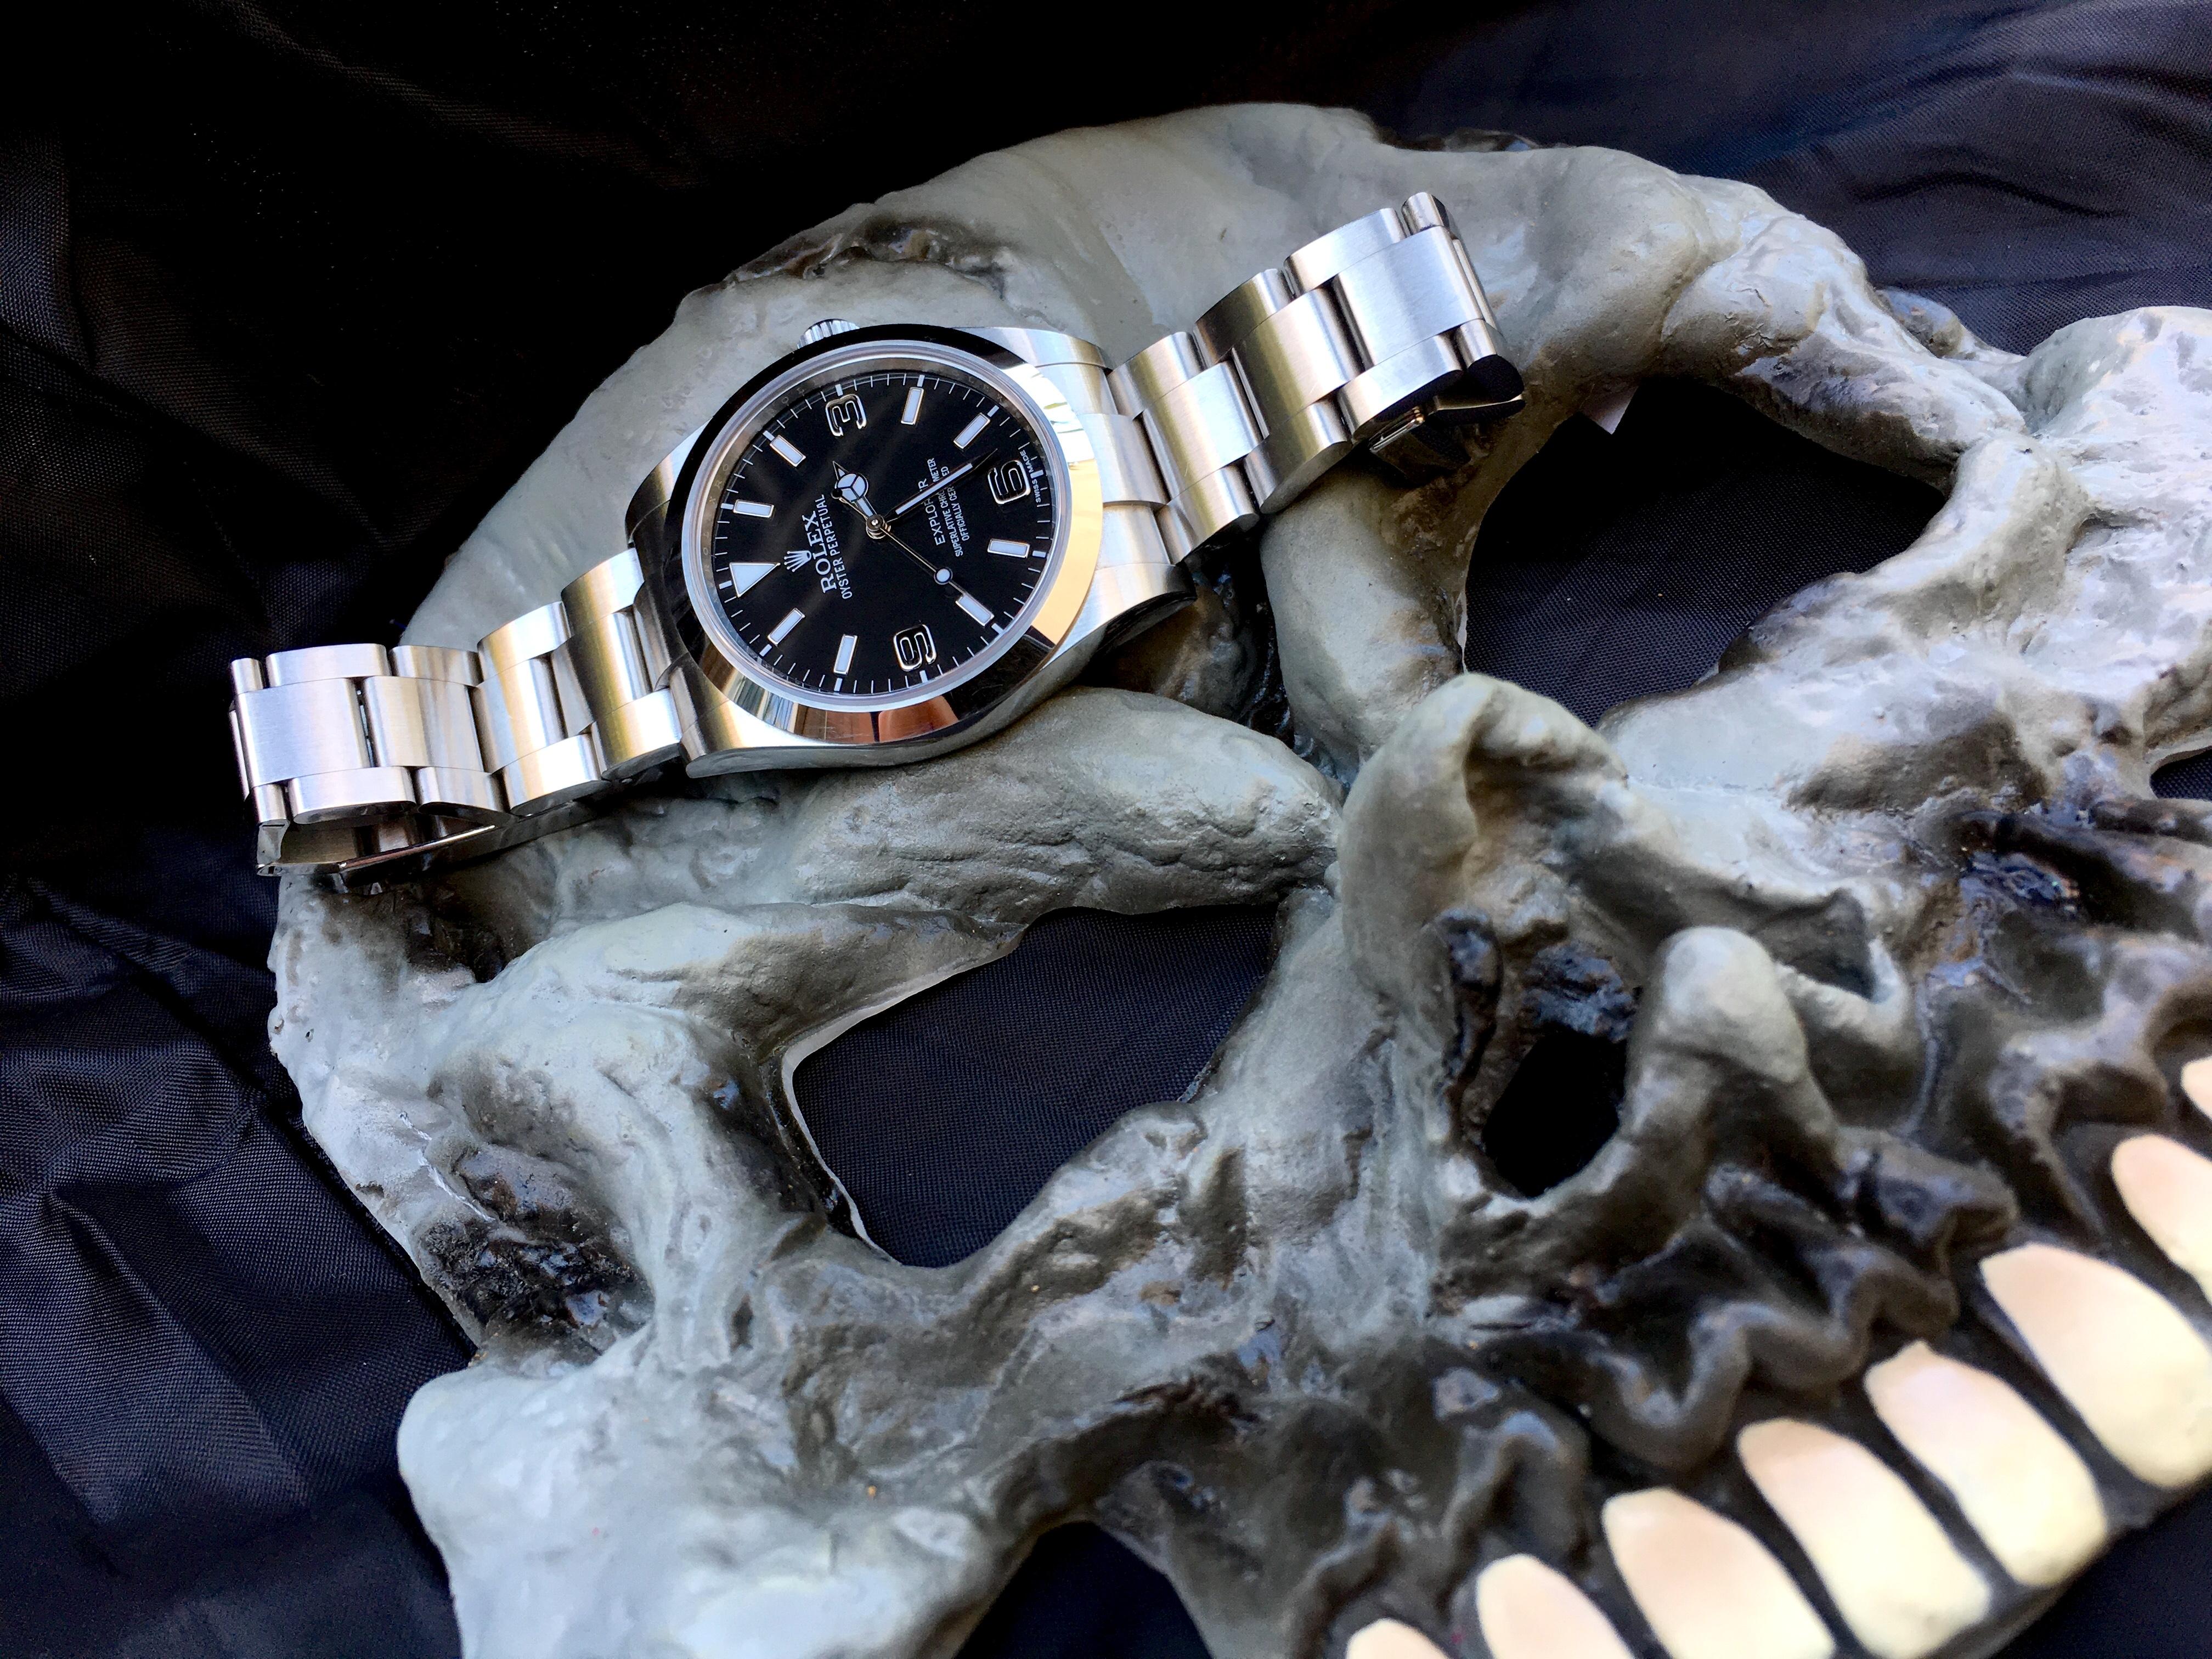 La montre d'Halloween!!! Bouh!! 848049AEAA8B359E074310AEE92B22071FA38F